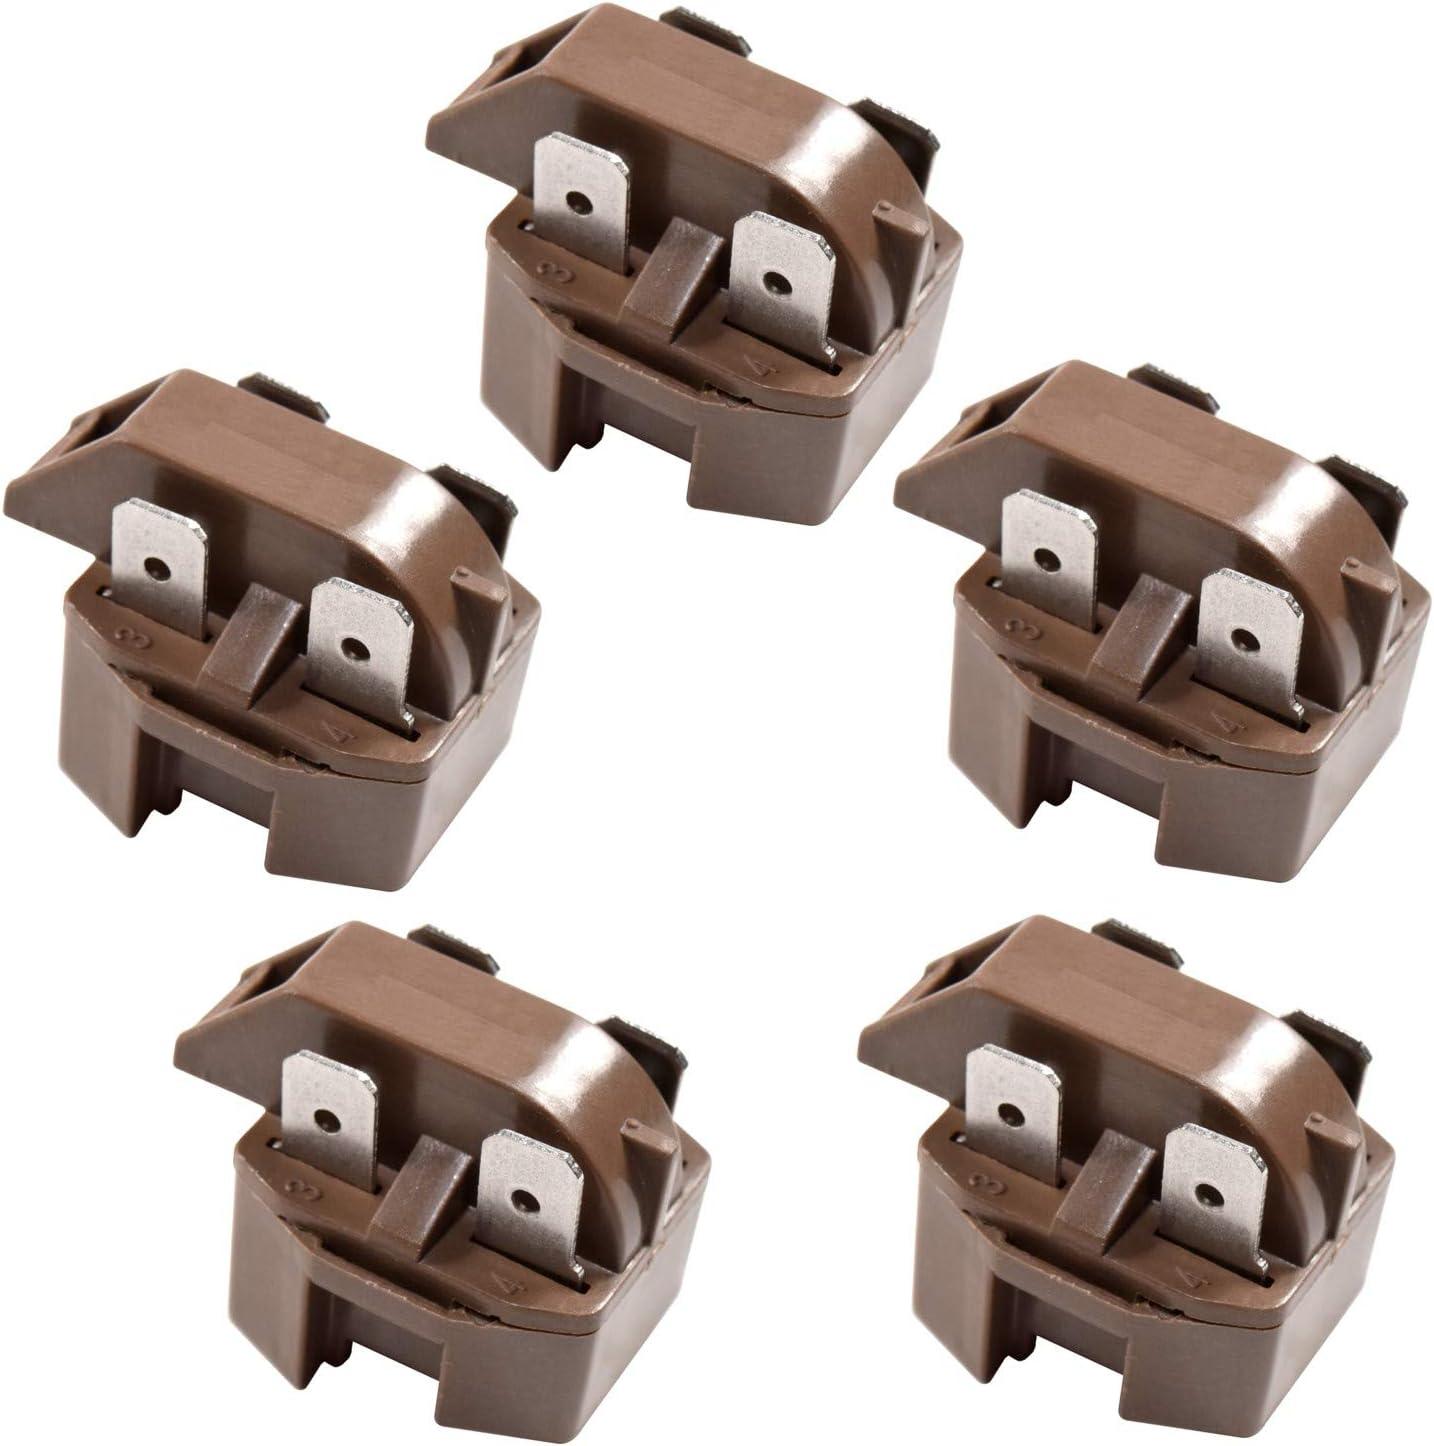 HQRP 5-Pack 4 Pin Universal Refrigerator Freezer Compressor PTC Start Relays Starter IC-4 Replacement plus HQRP Coaster